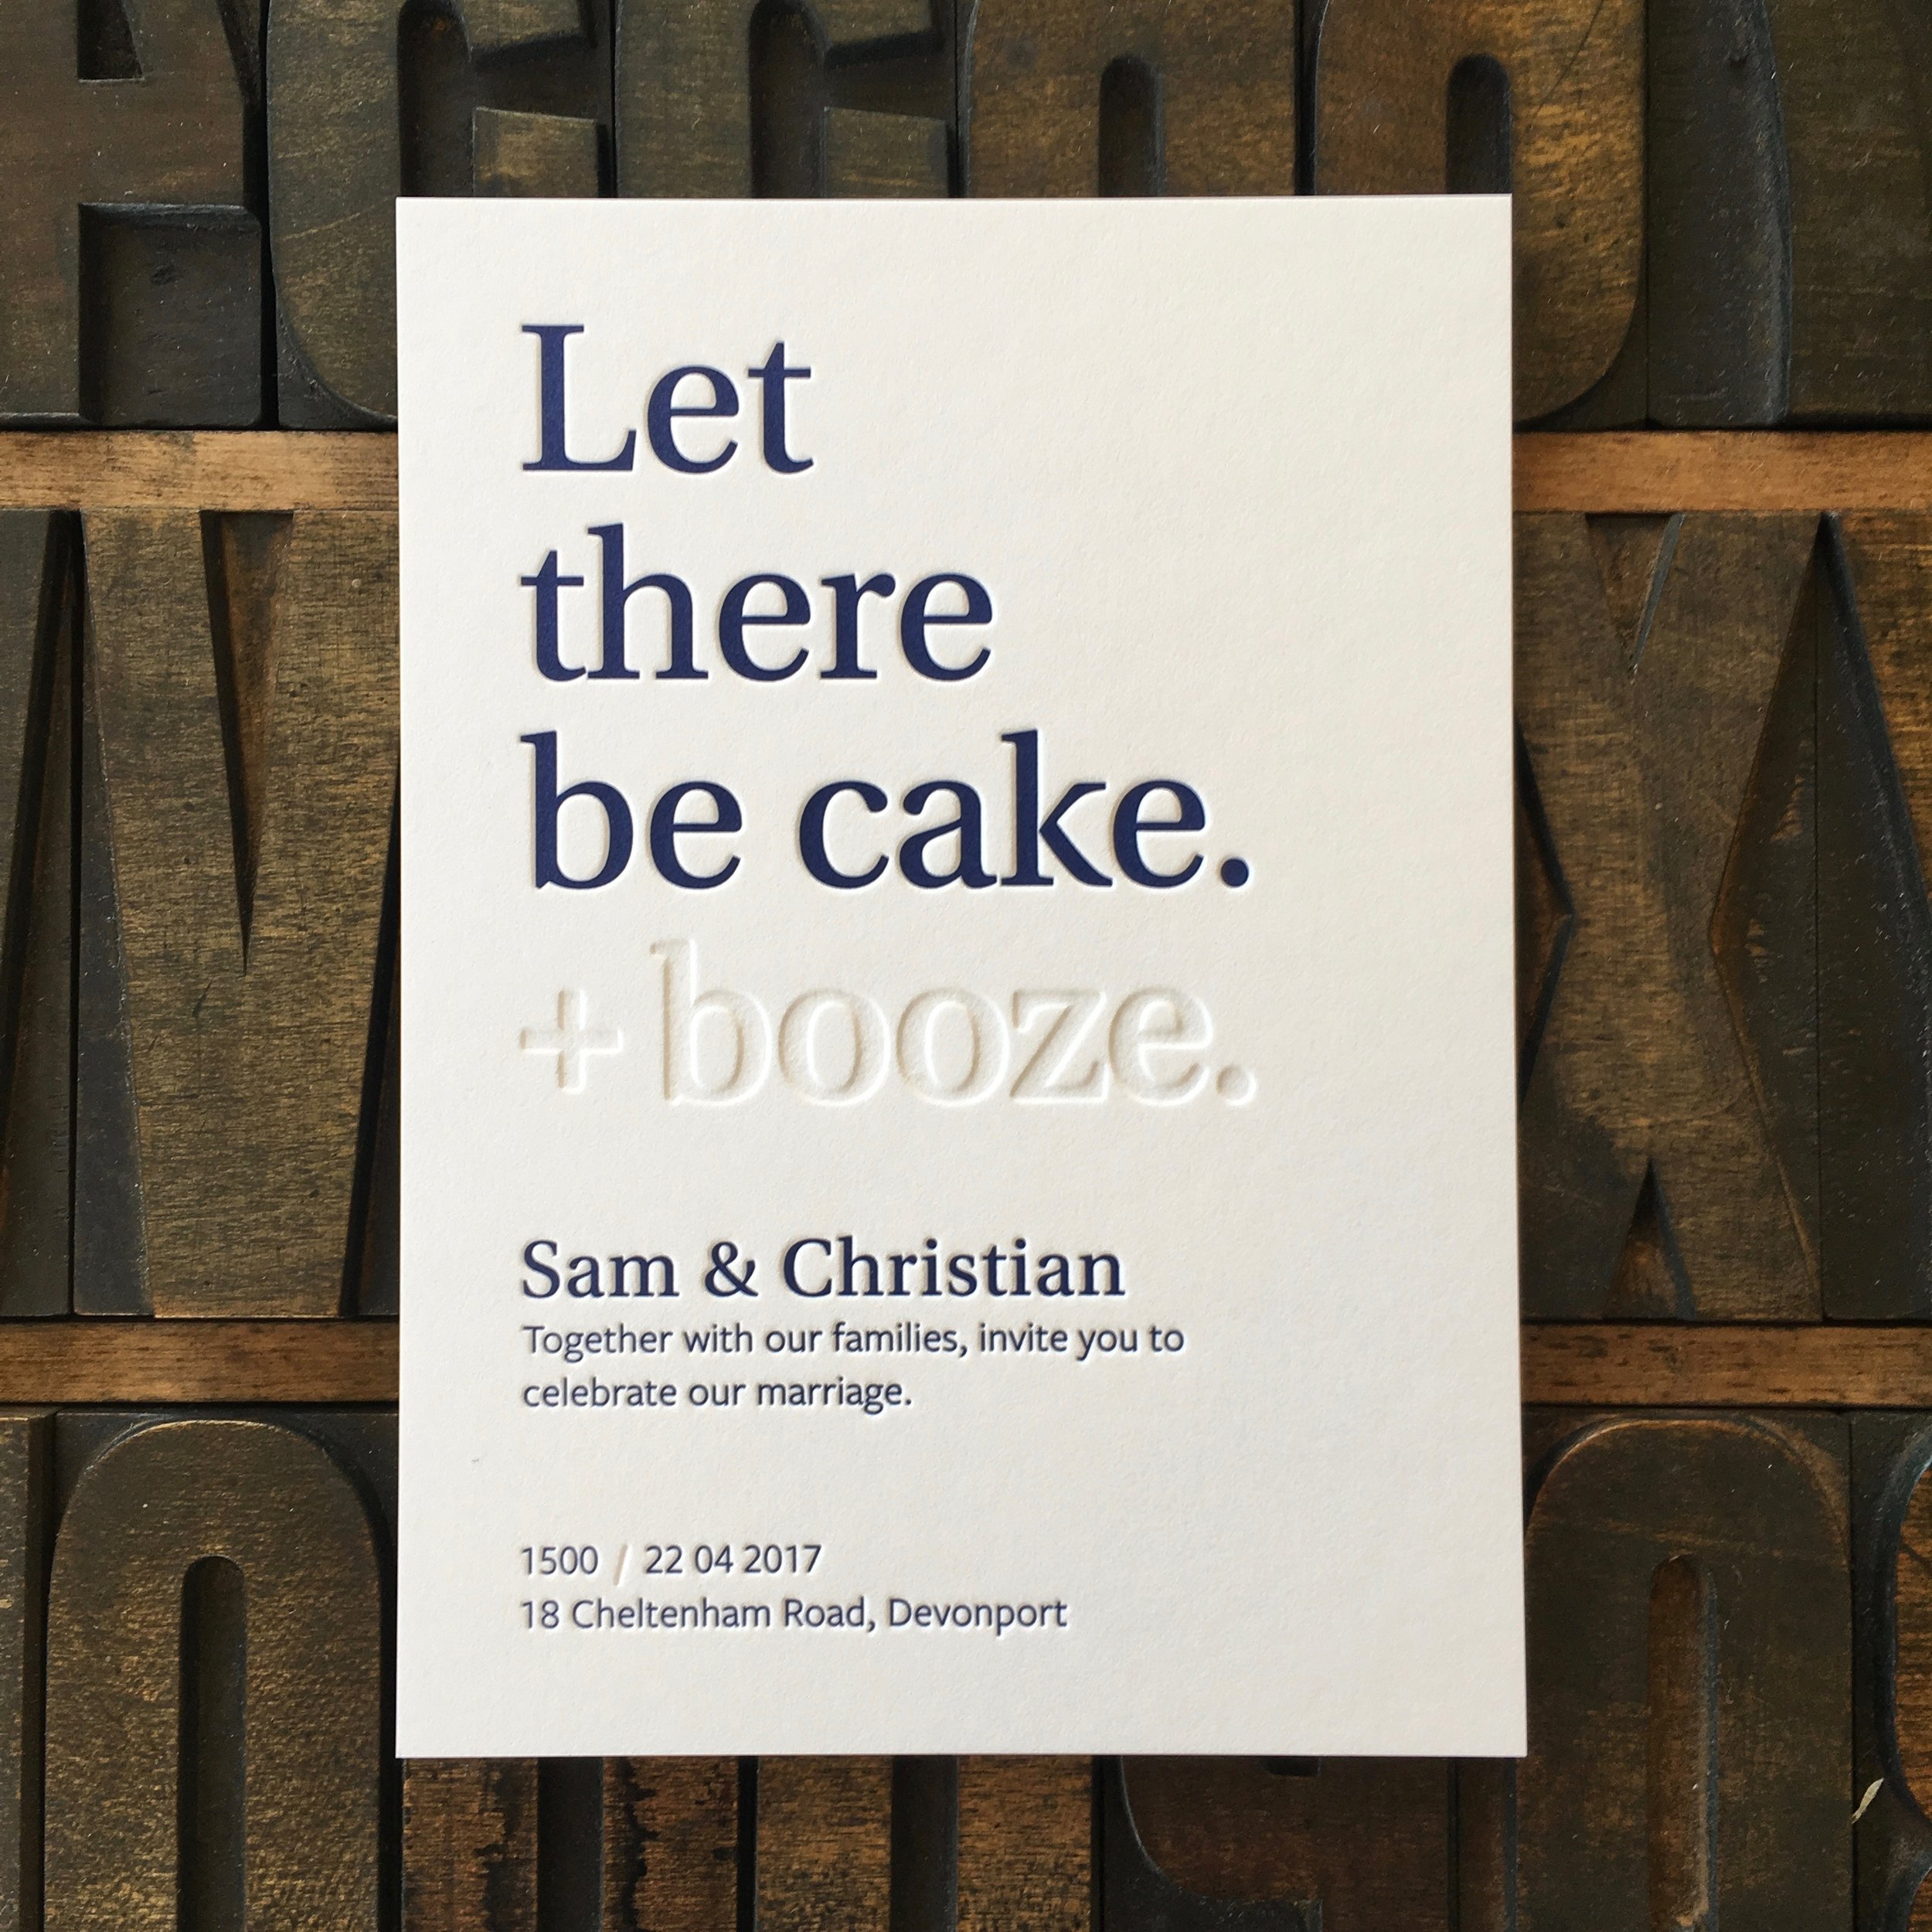 Sam & Christian, one colour + blind letterpress print on 600gsm white cotton